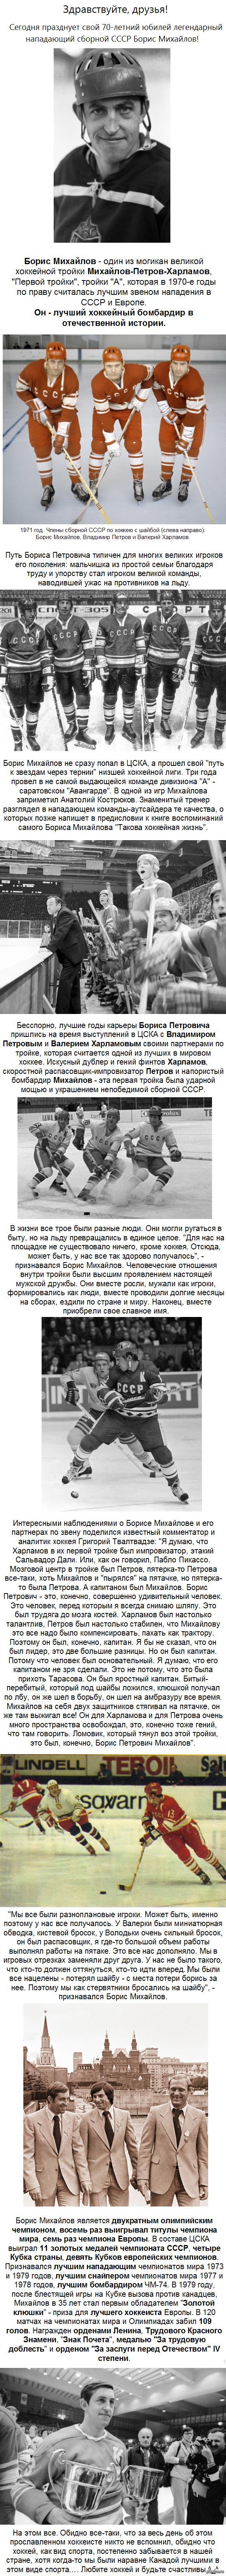 С днем рождения, Борис Петрович!